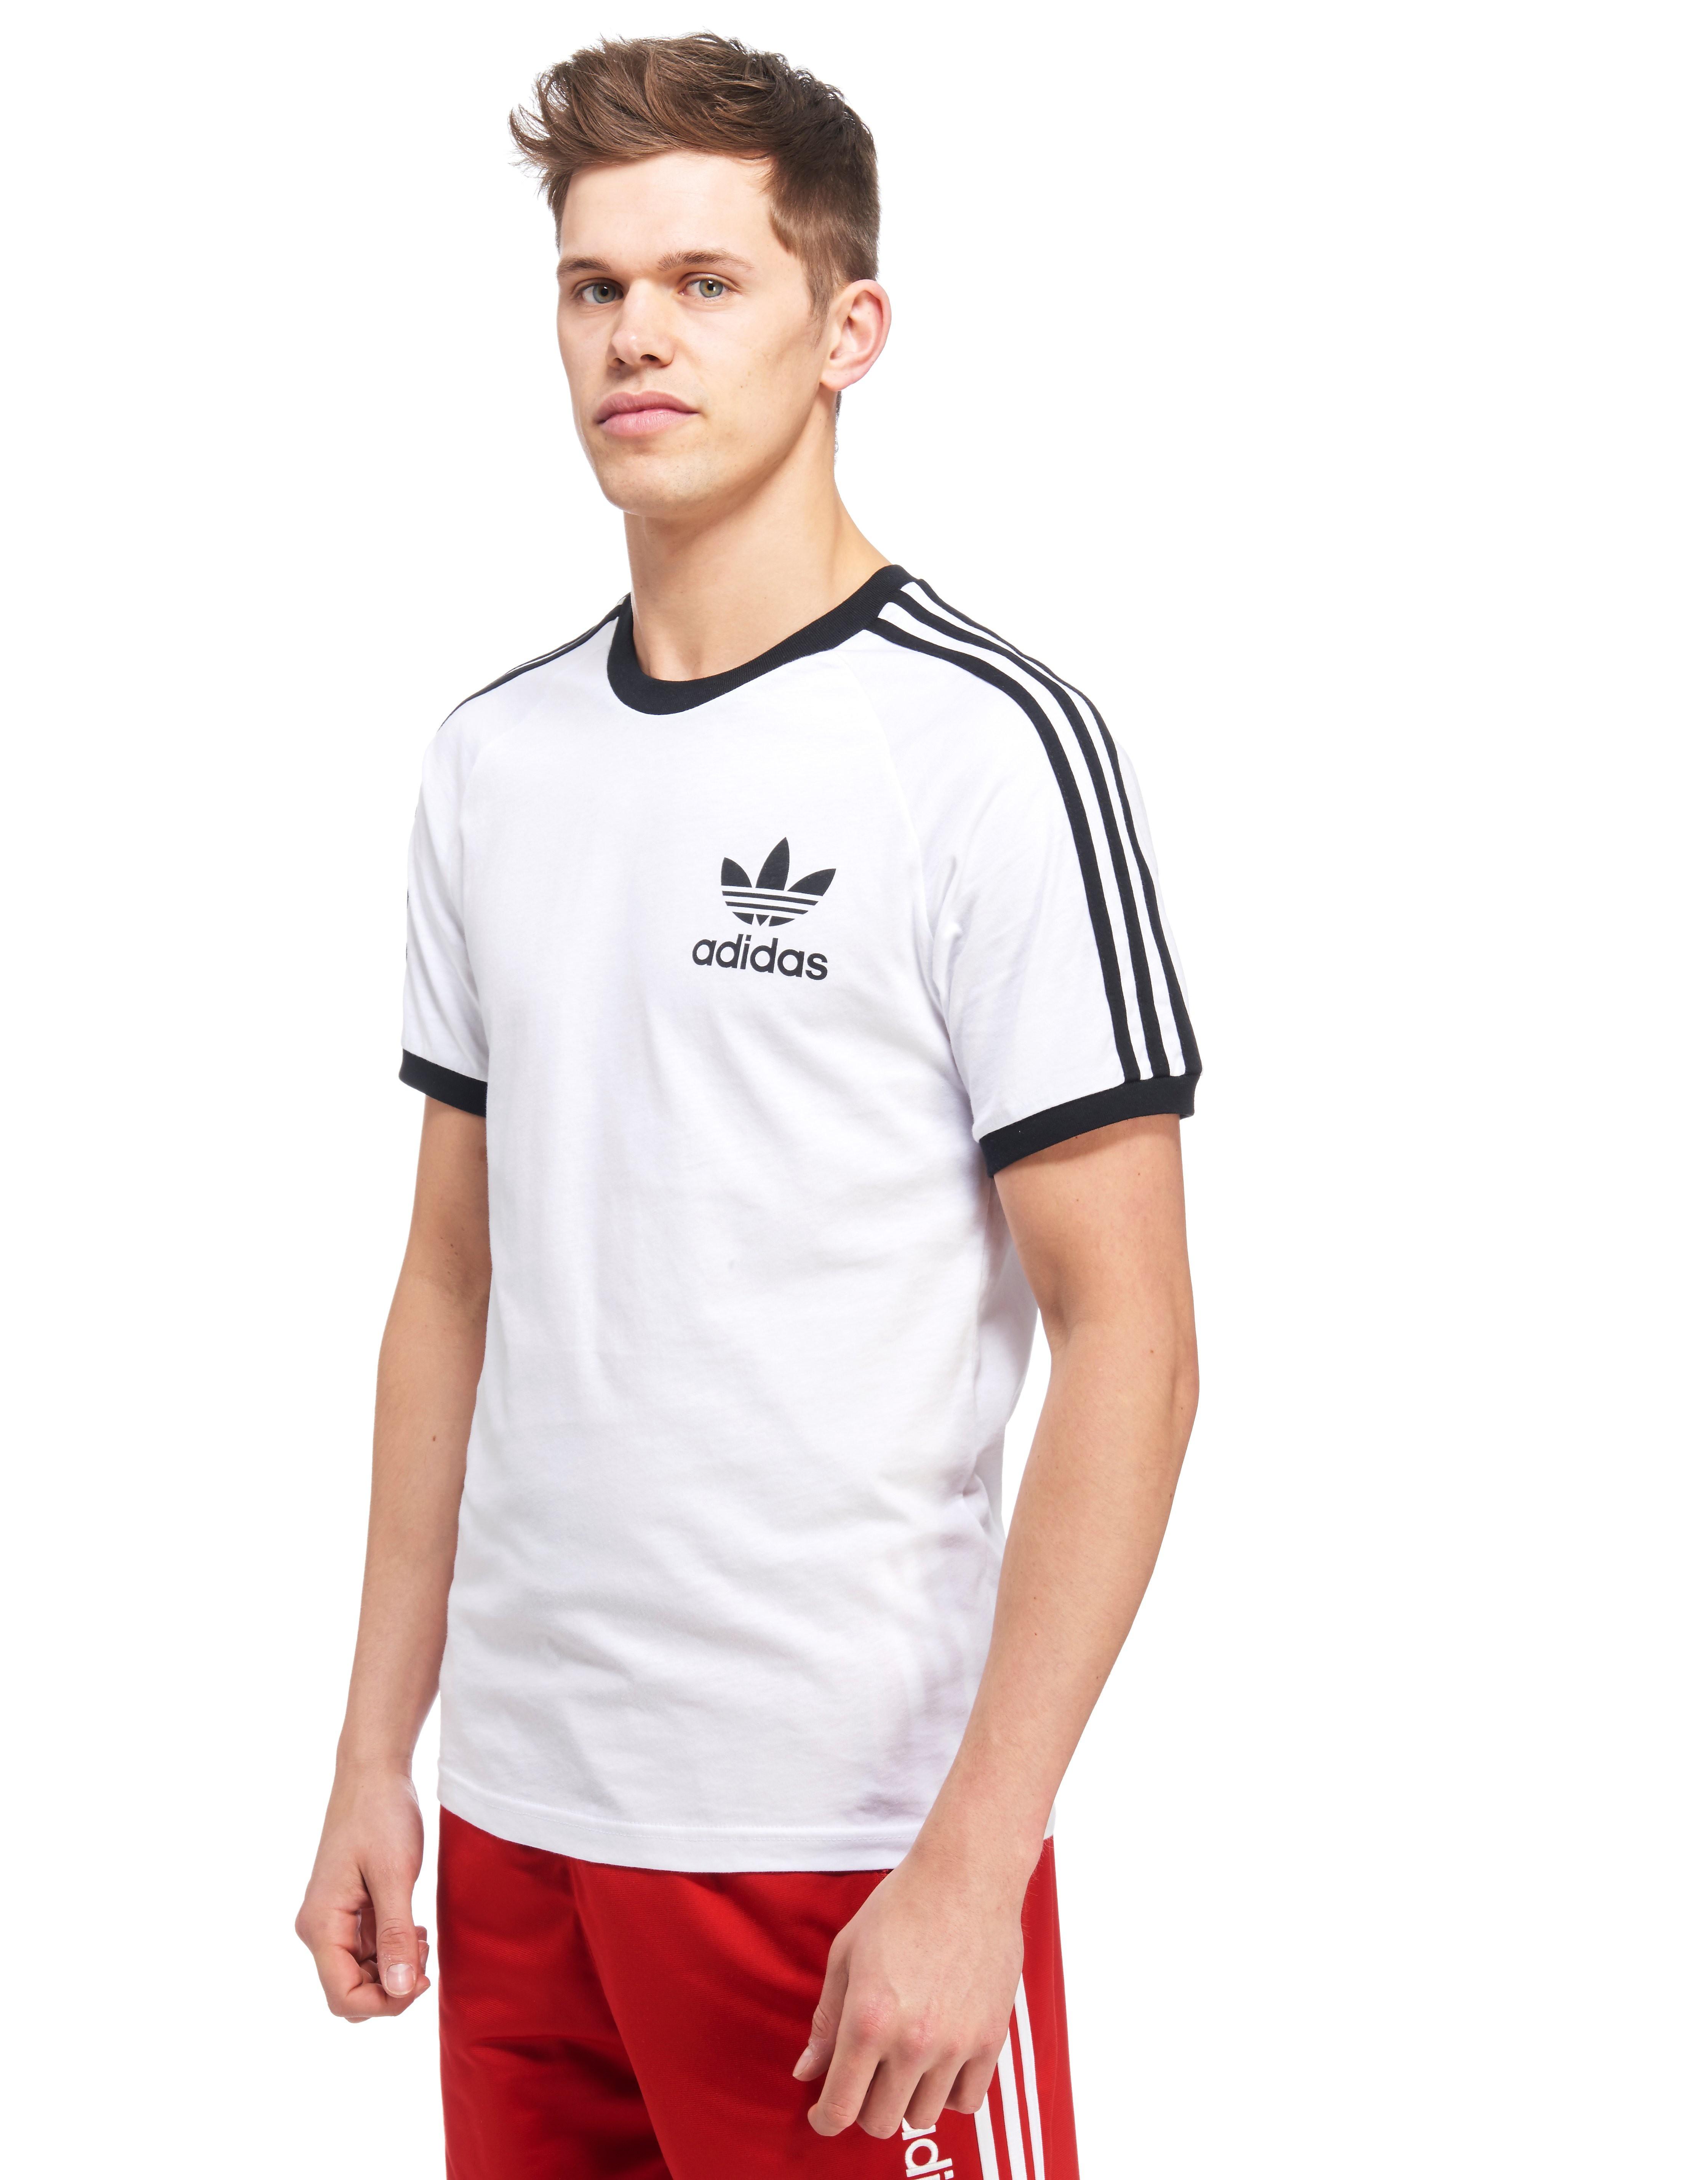 adidas Originals T-Shirt California